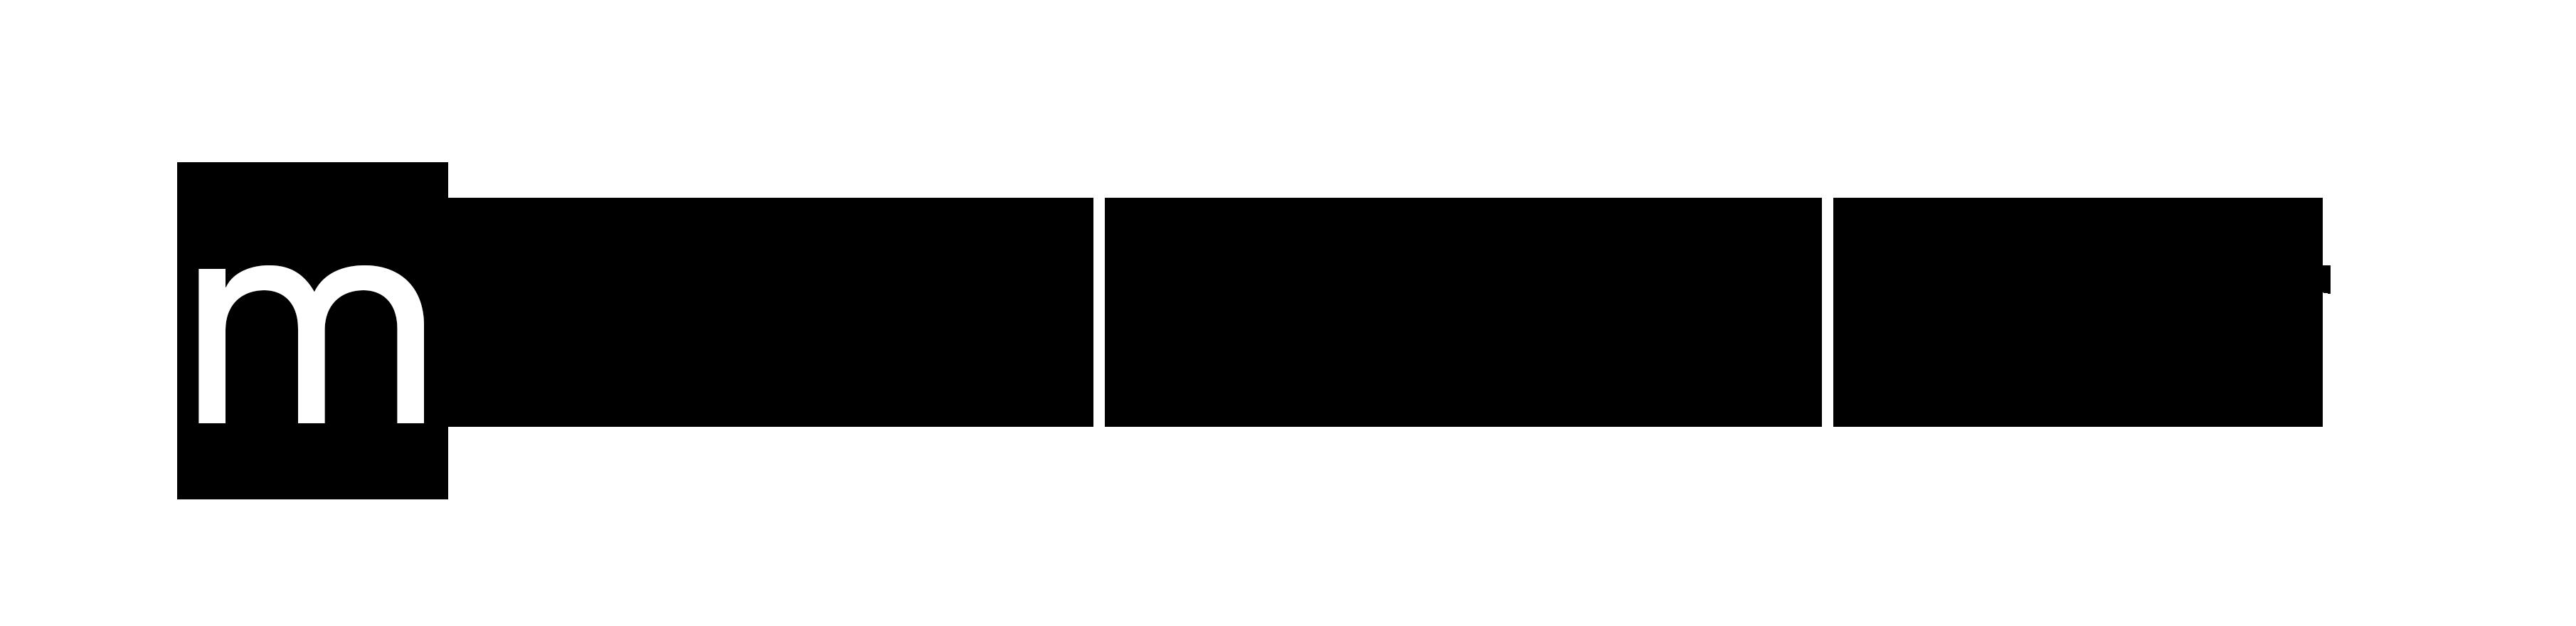 medienbunker logo – schwarz